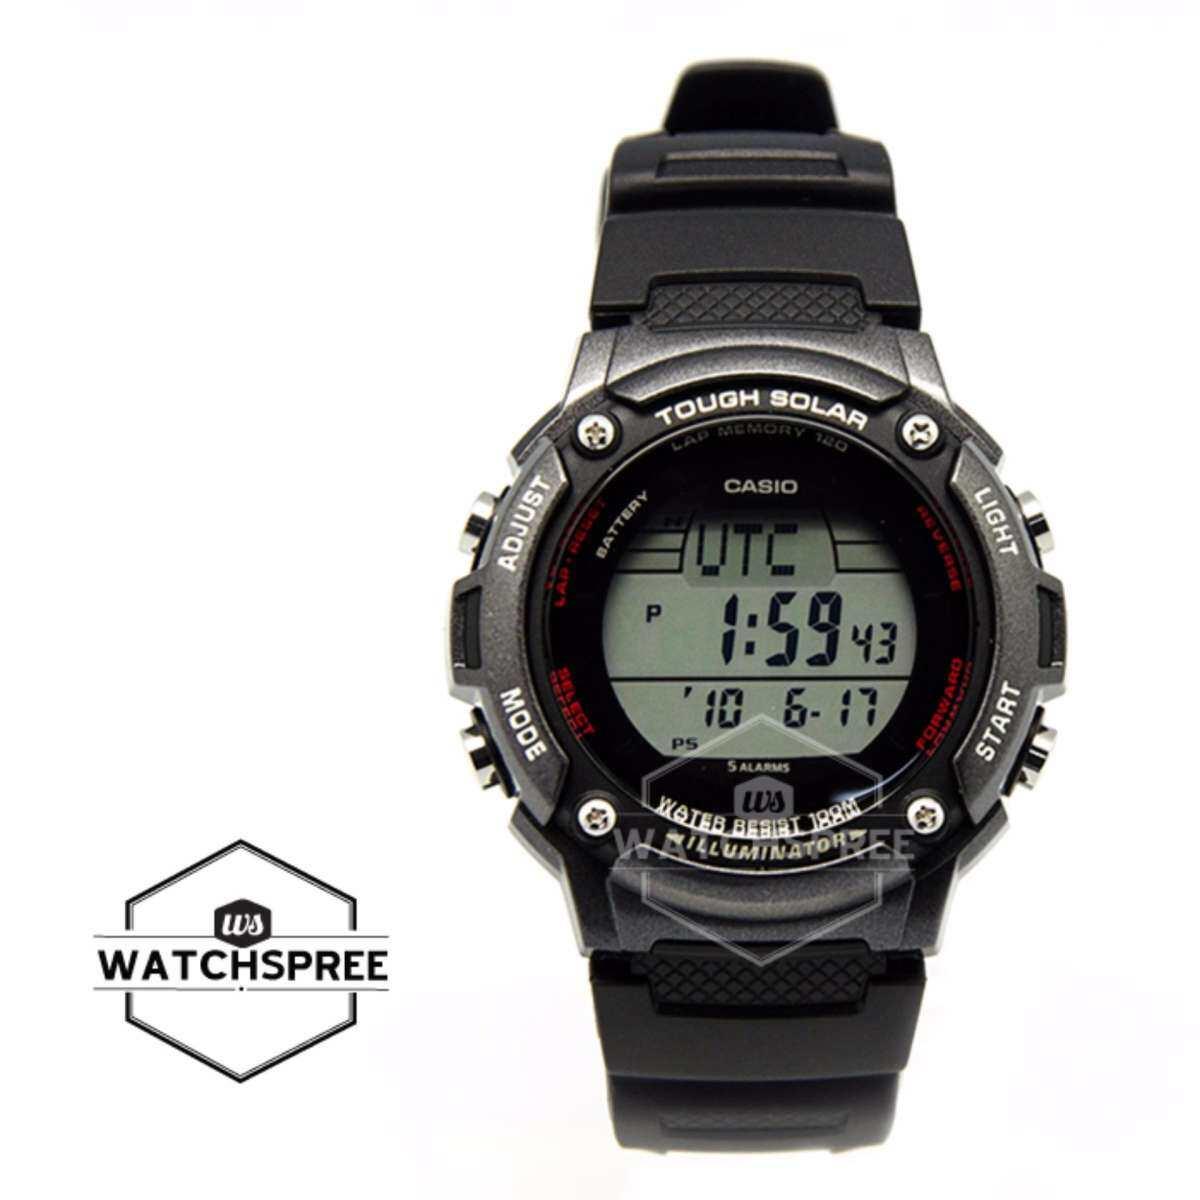 Casio Pria Digital Tough Solar Hitam Resin Strap Watch WS200H-1B W-S200H-